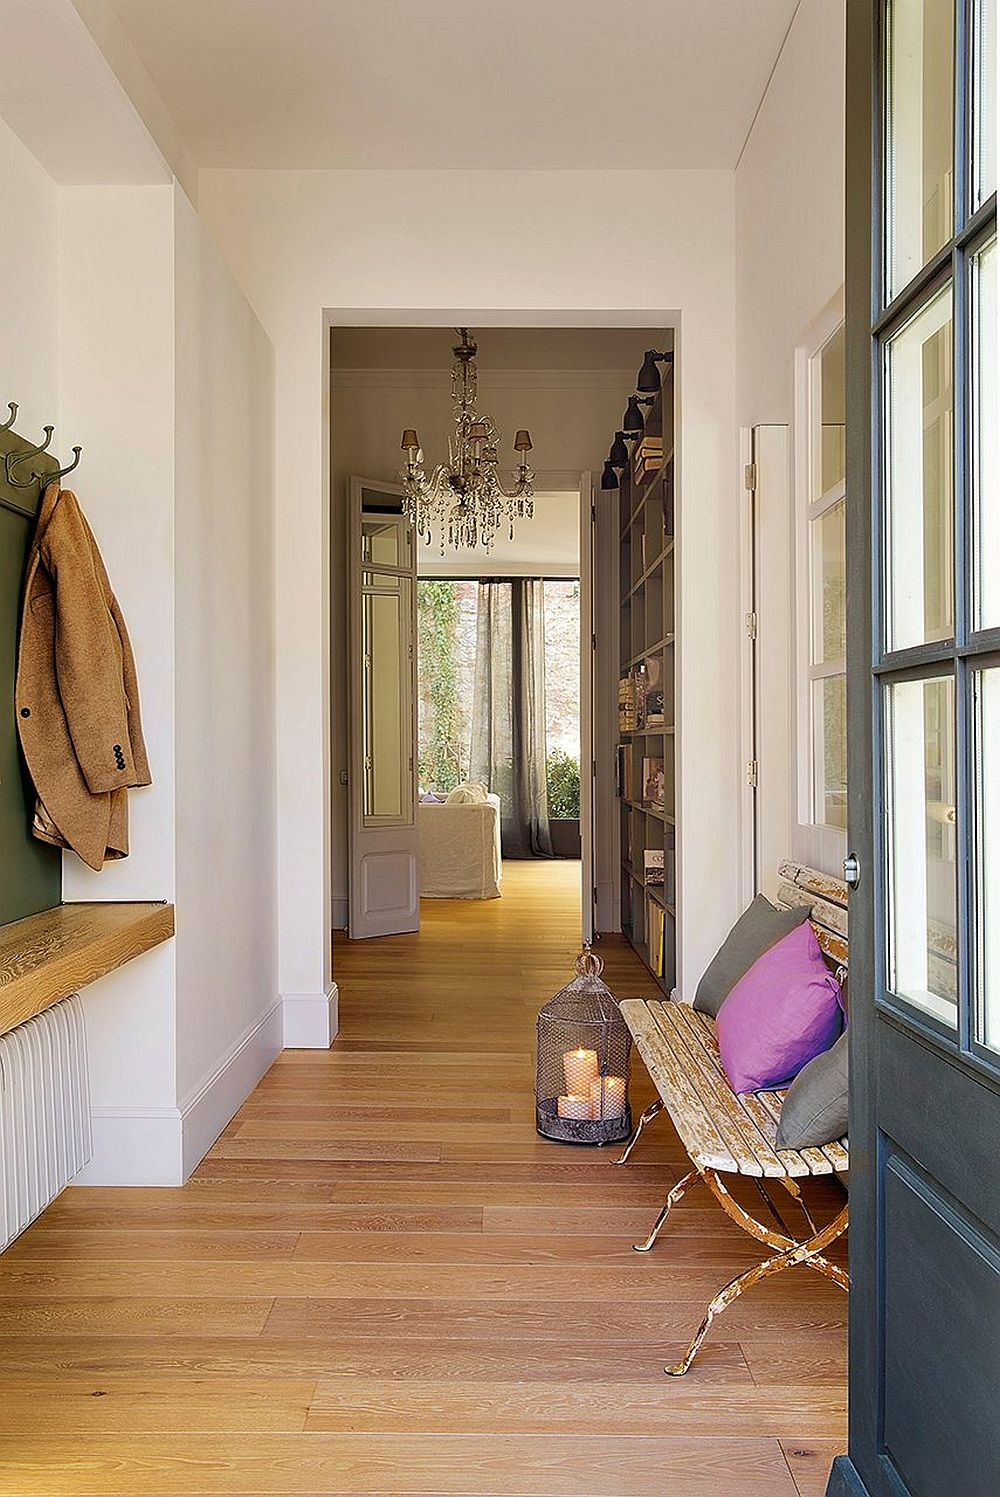 adelaparvu.com despre casa veche renovata, arhitect Albert Blanch, designer Gaby Conde, Foto ElMueble (20)